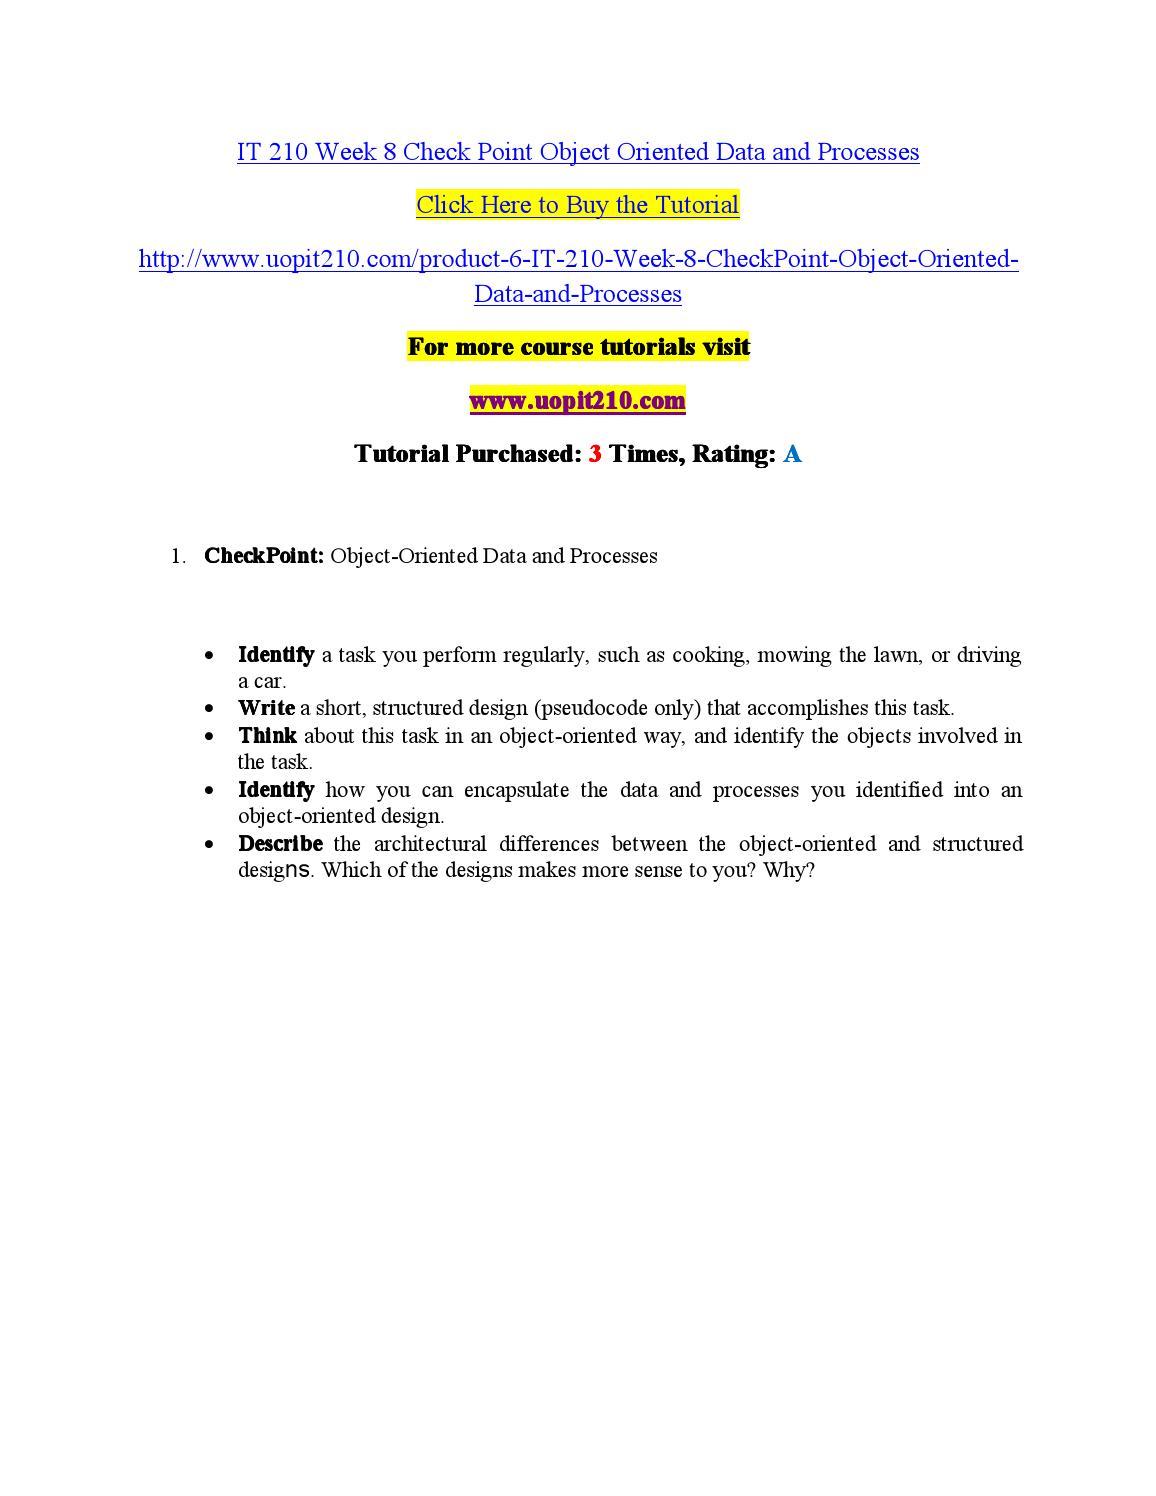 IT 210 Read, Lead, Succeed/Uophelpdotcom